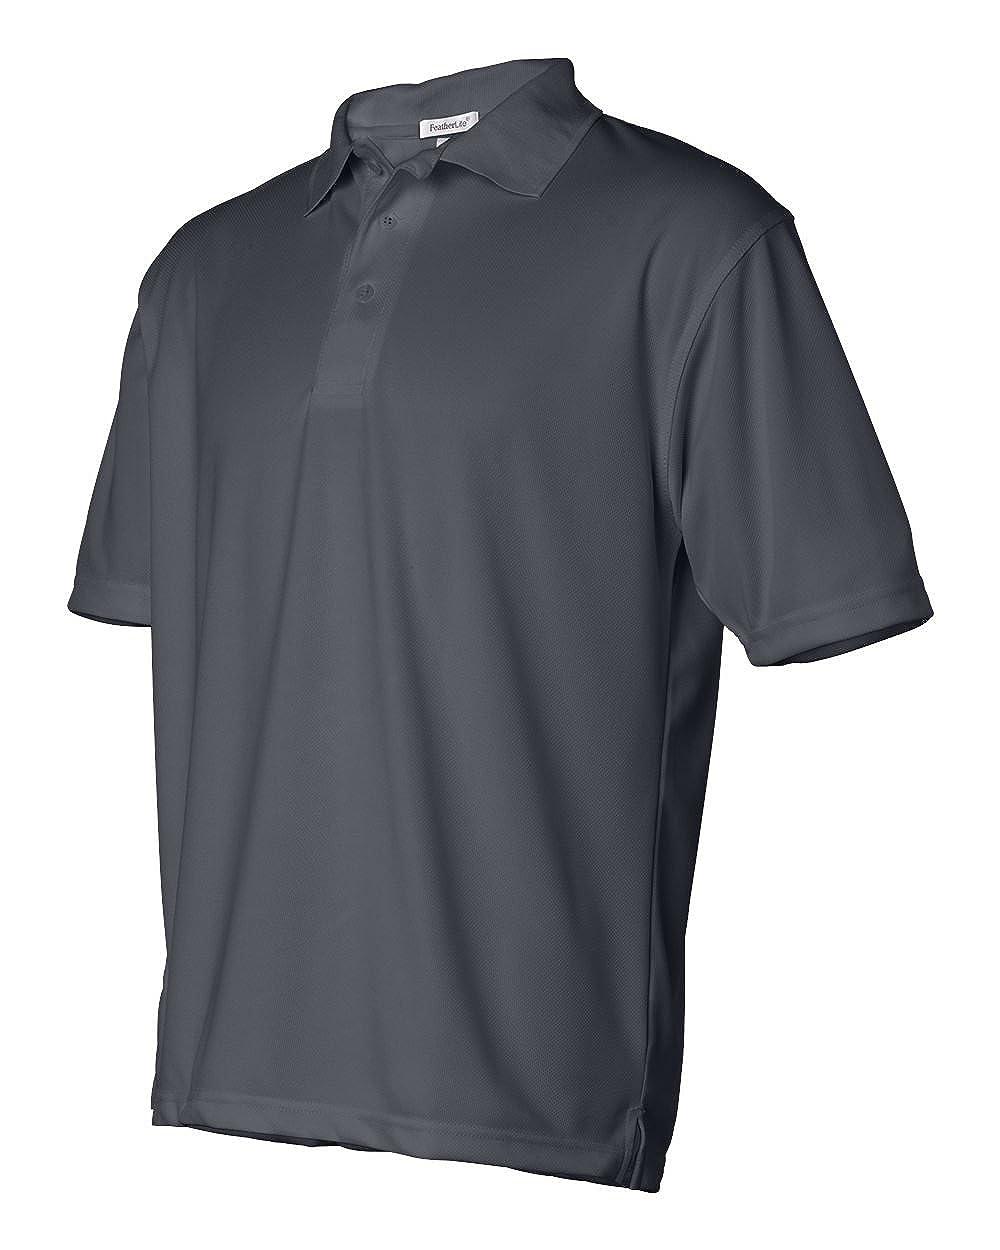 FeatherLite 0469 Moisture Free Mesh Sport Shirt